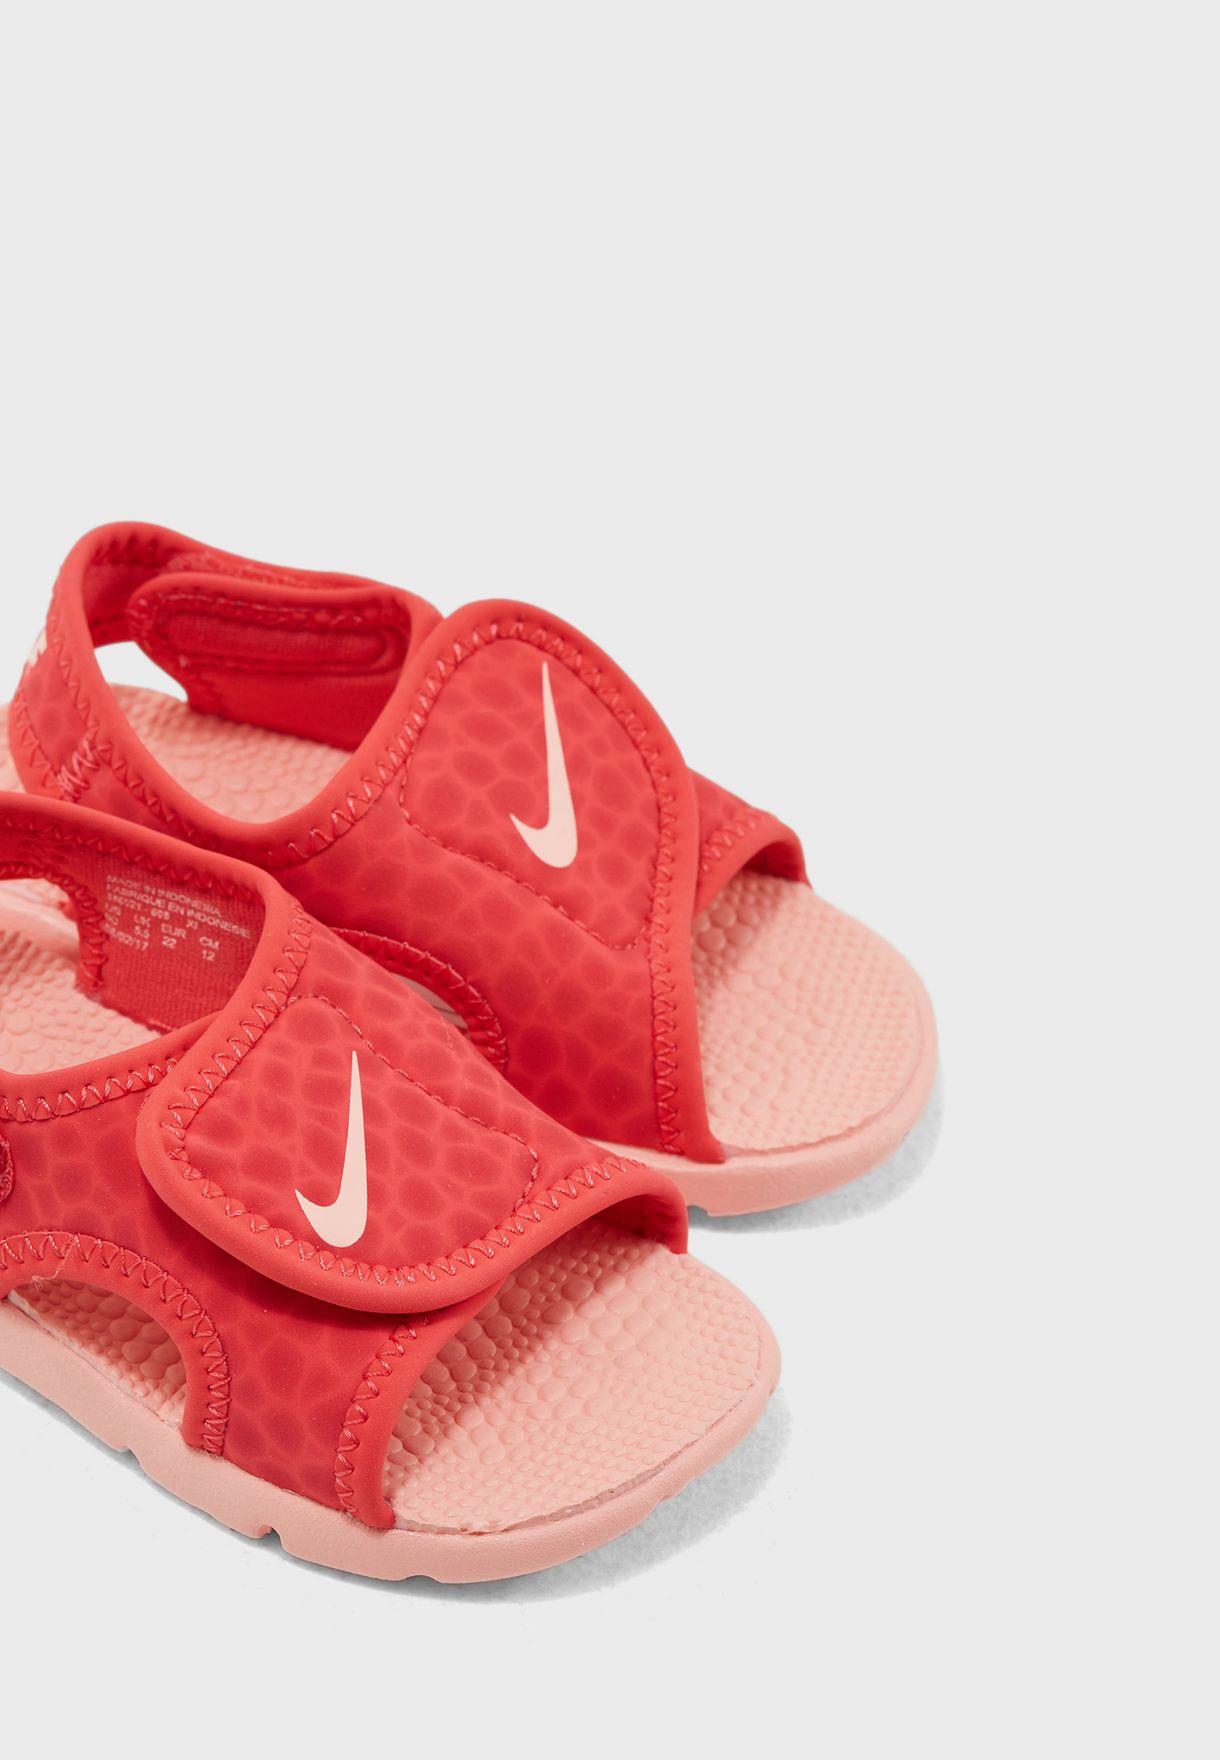 986f0ad1681 Shop Nike prints Sunray Adjust 4 Infant 386521-608 for Kids in Kuwait ...